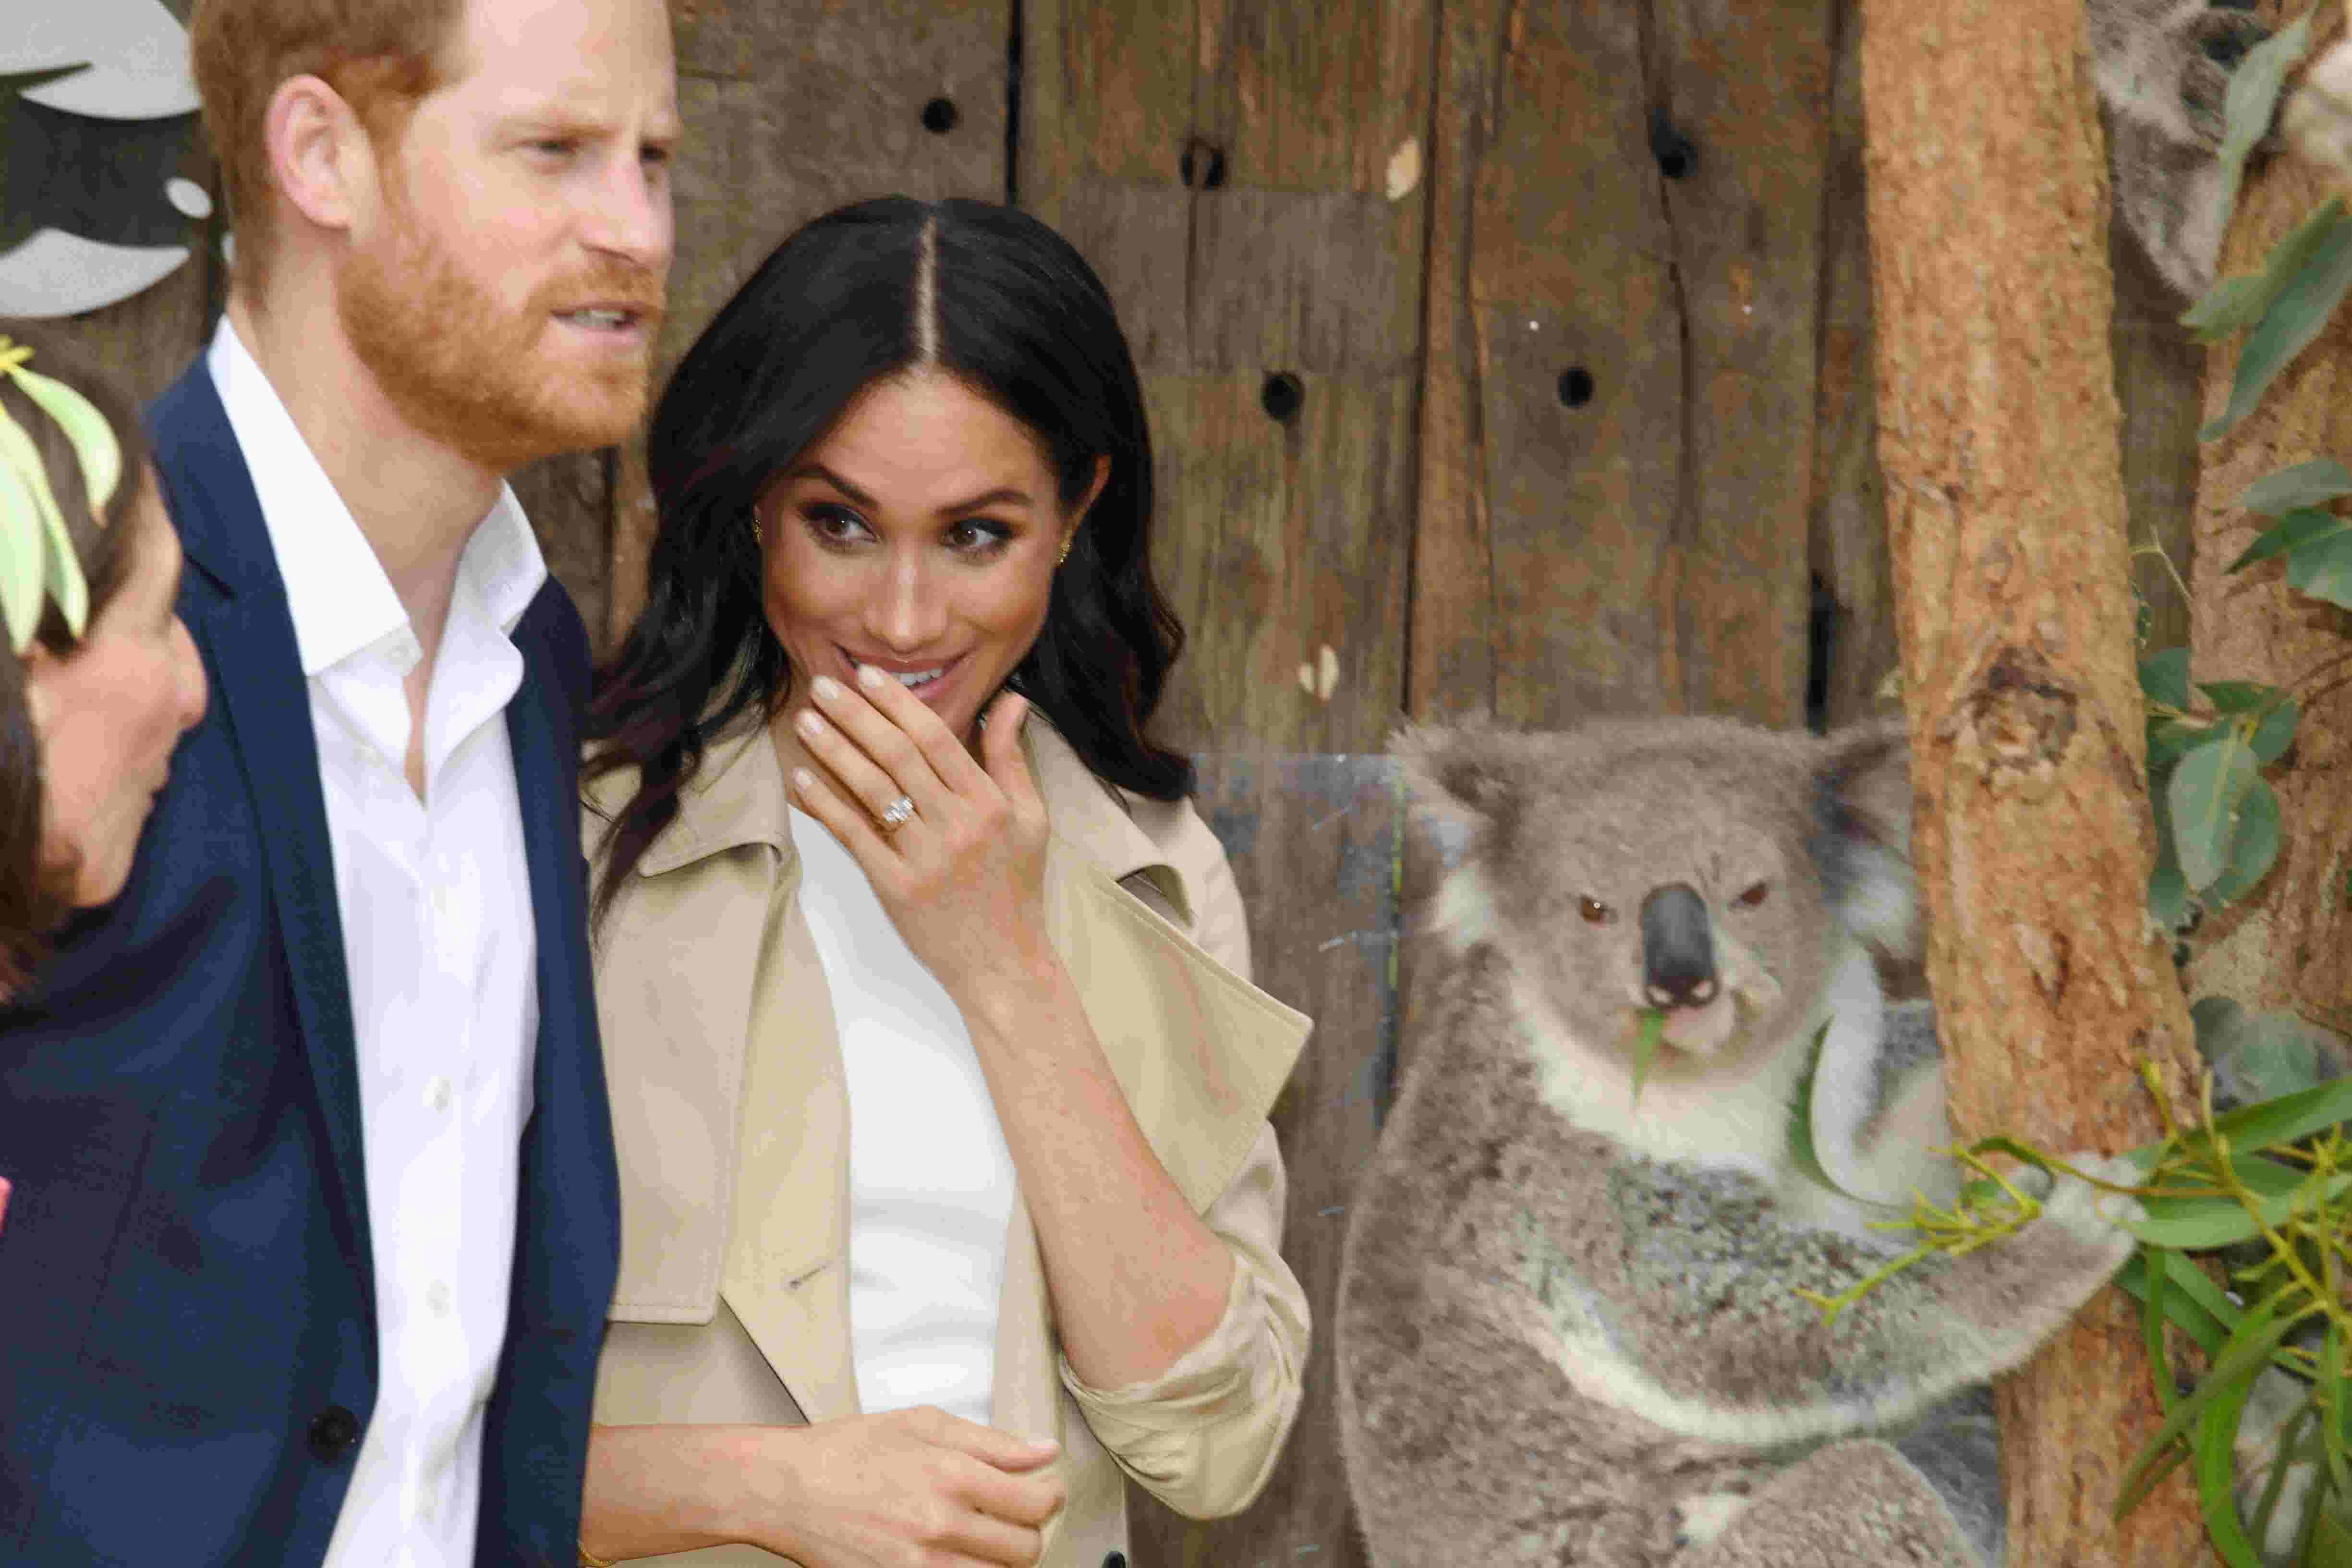 cc96e1d4bce4 Pregnant Duchess Meghan plays with koalas on royal tour in Australia